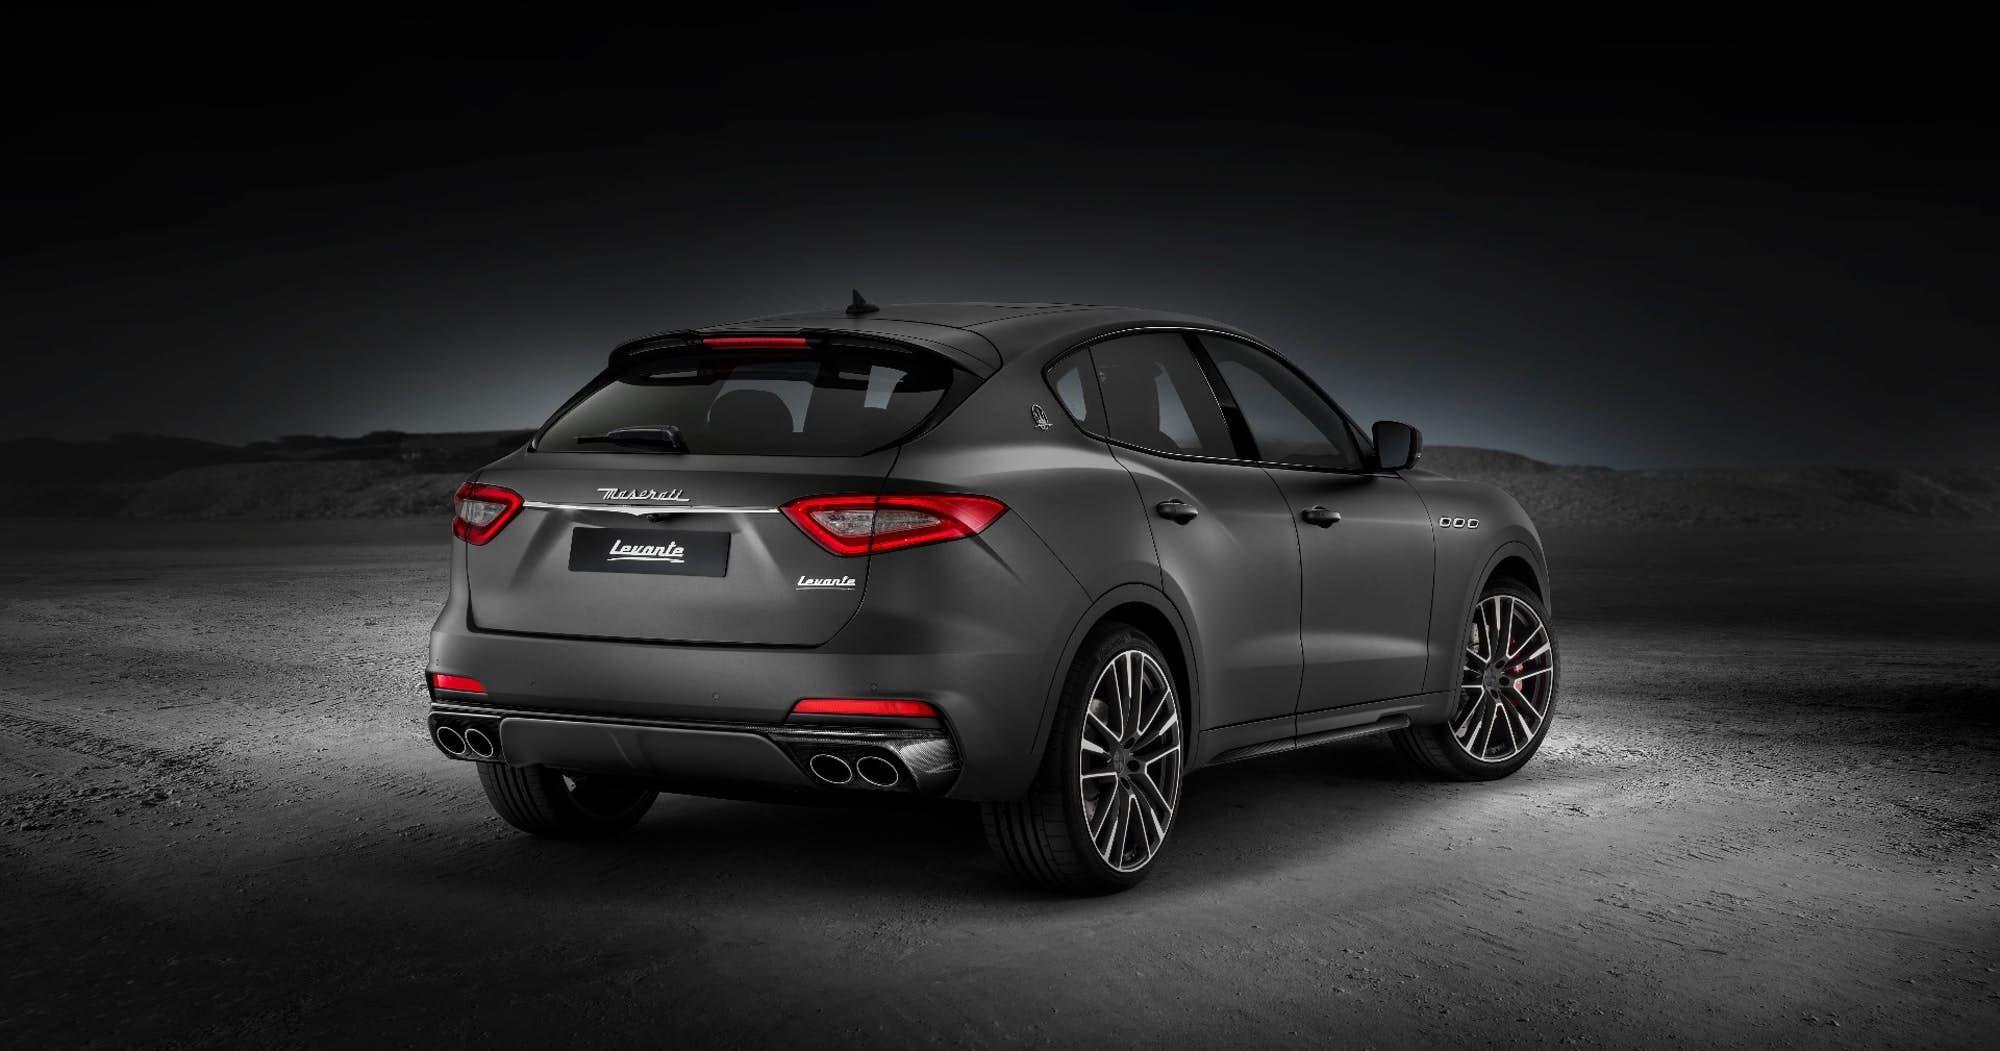 Maserati Levante Trofeo Rises To The Upper Echelons Of The